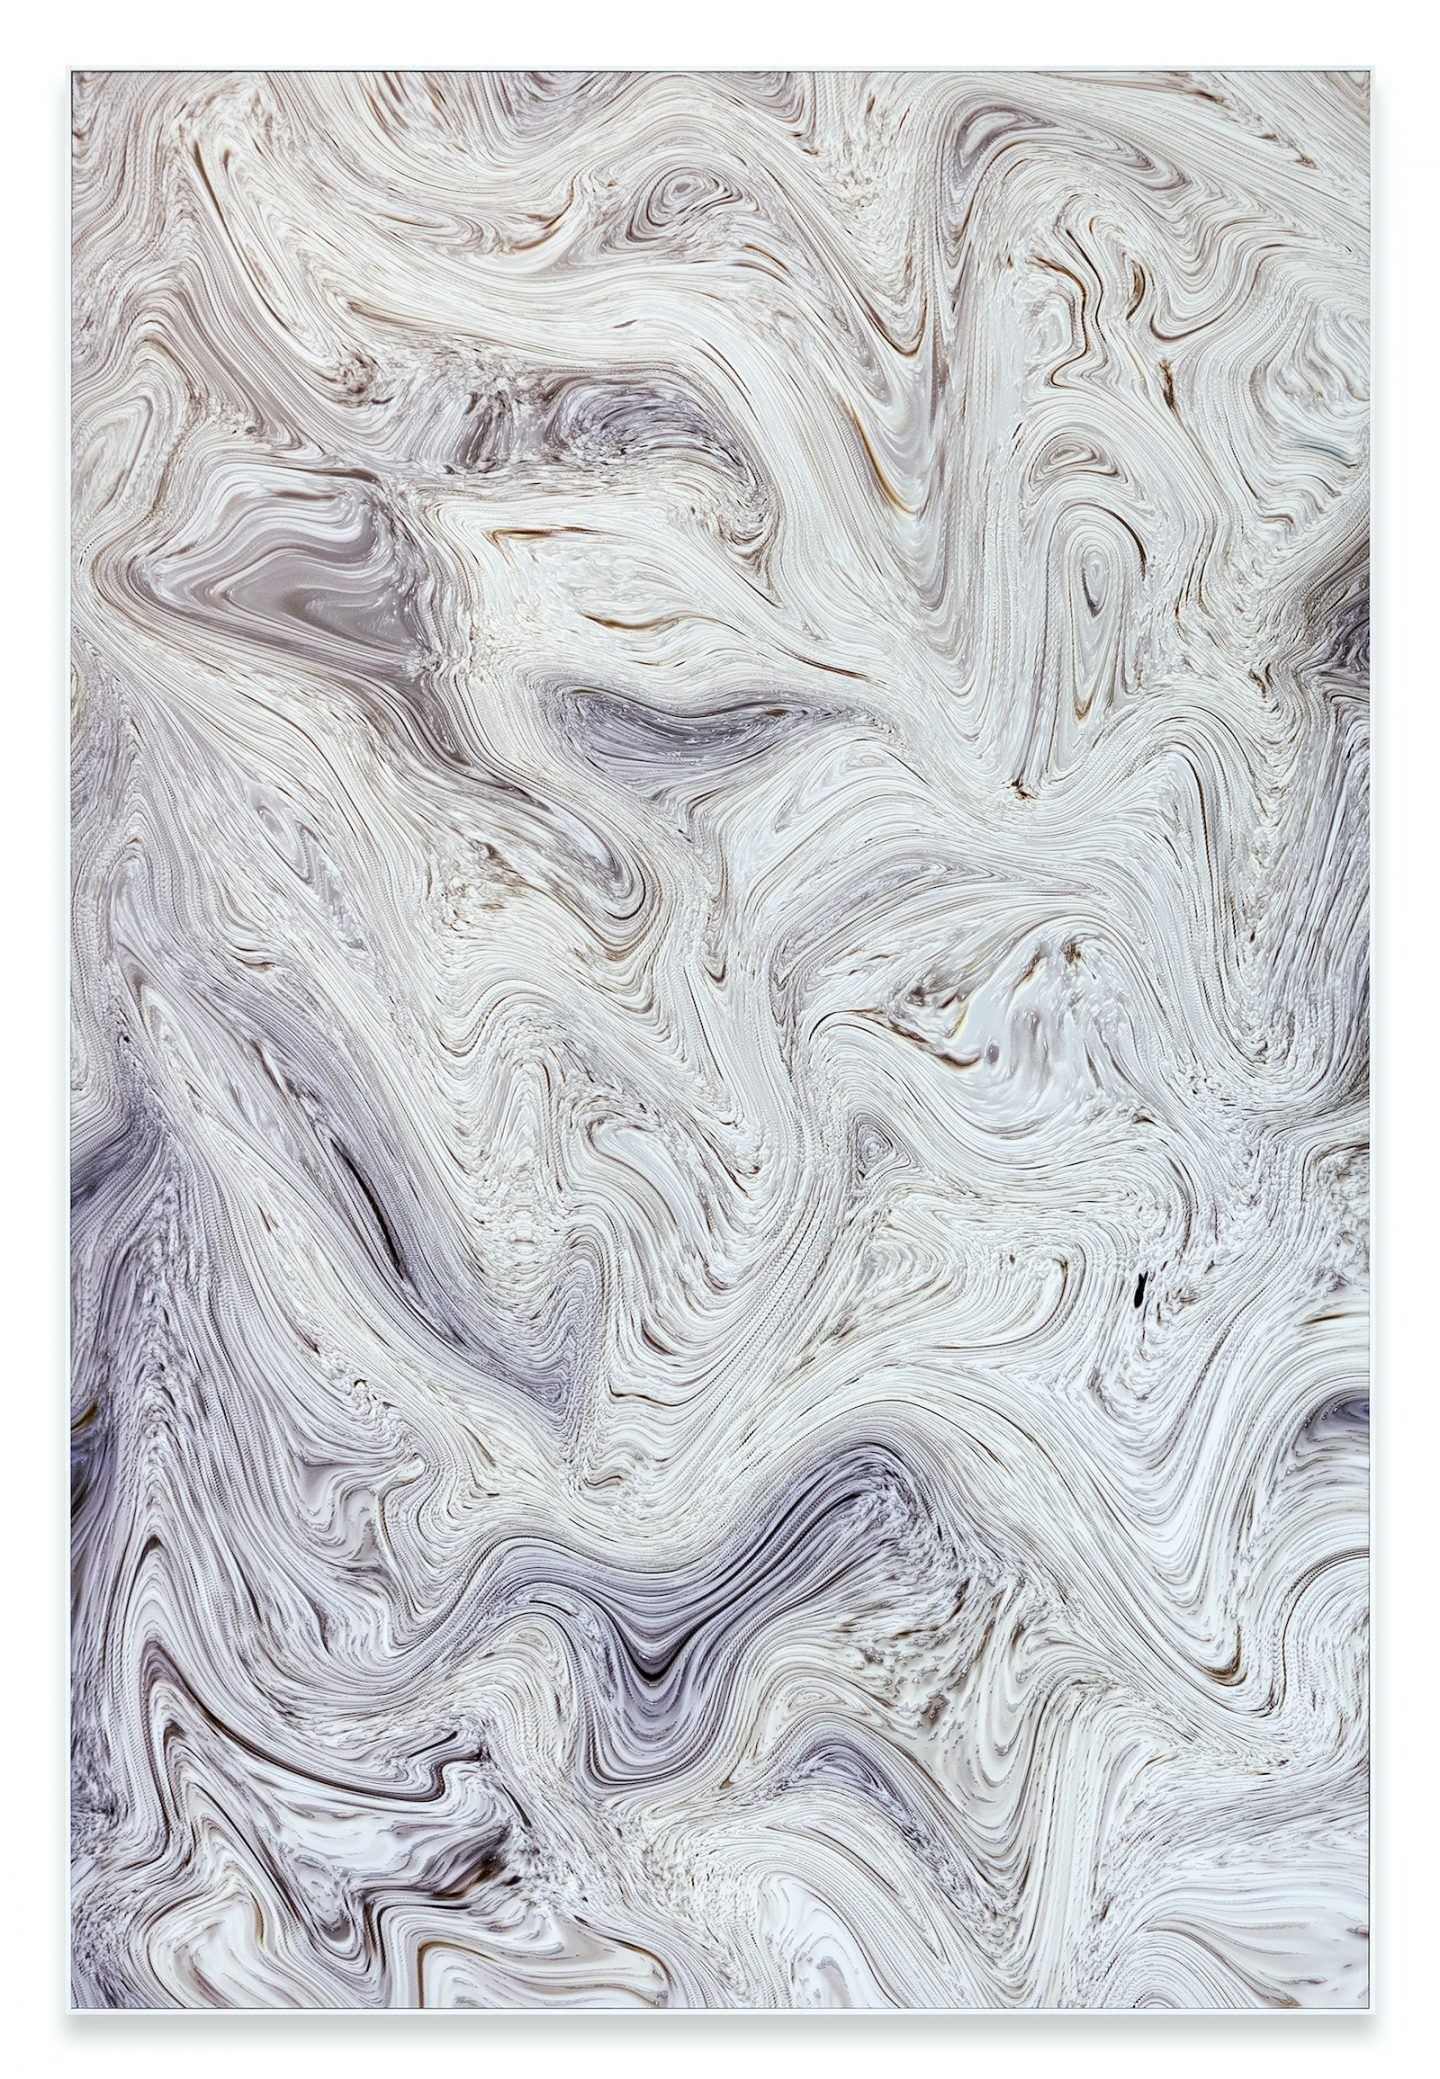 IGNANT-Art-David-Hanes-010